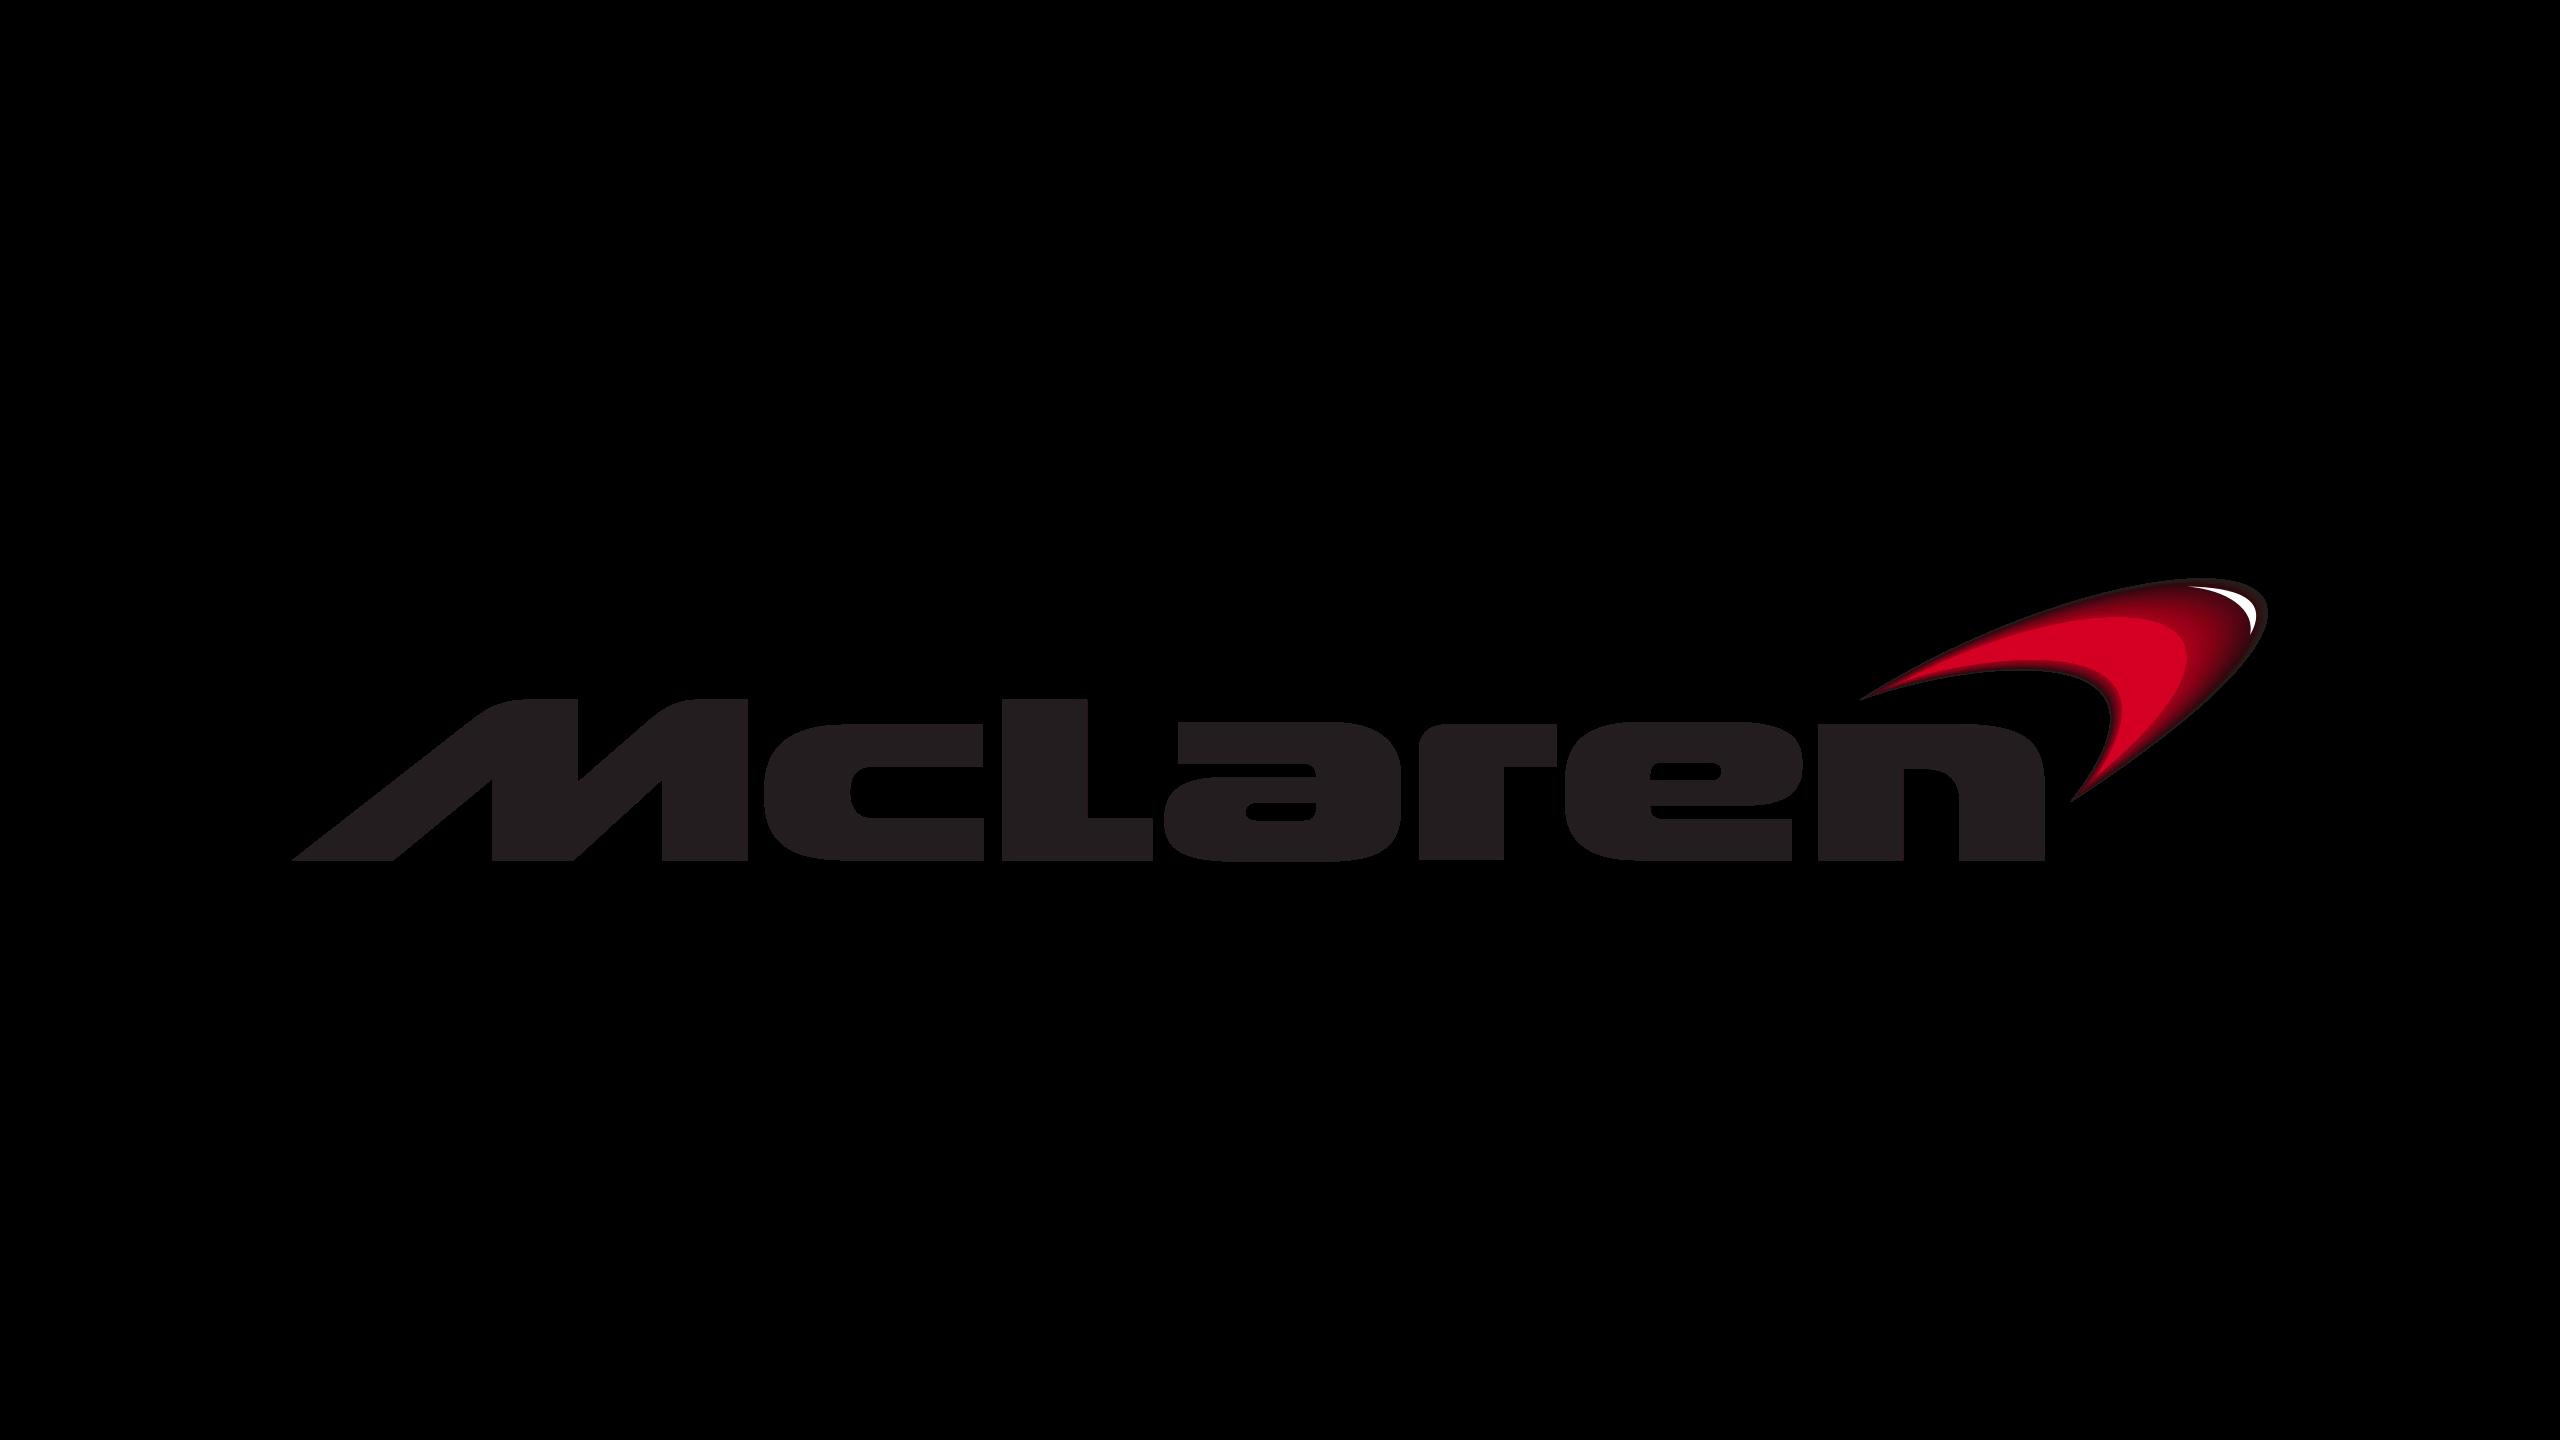 Car Logo Lincoln Transparent Png Stickpng